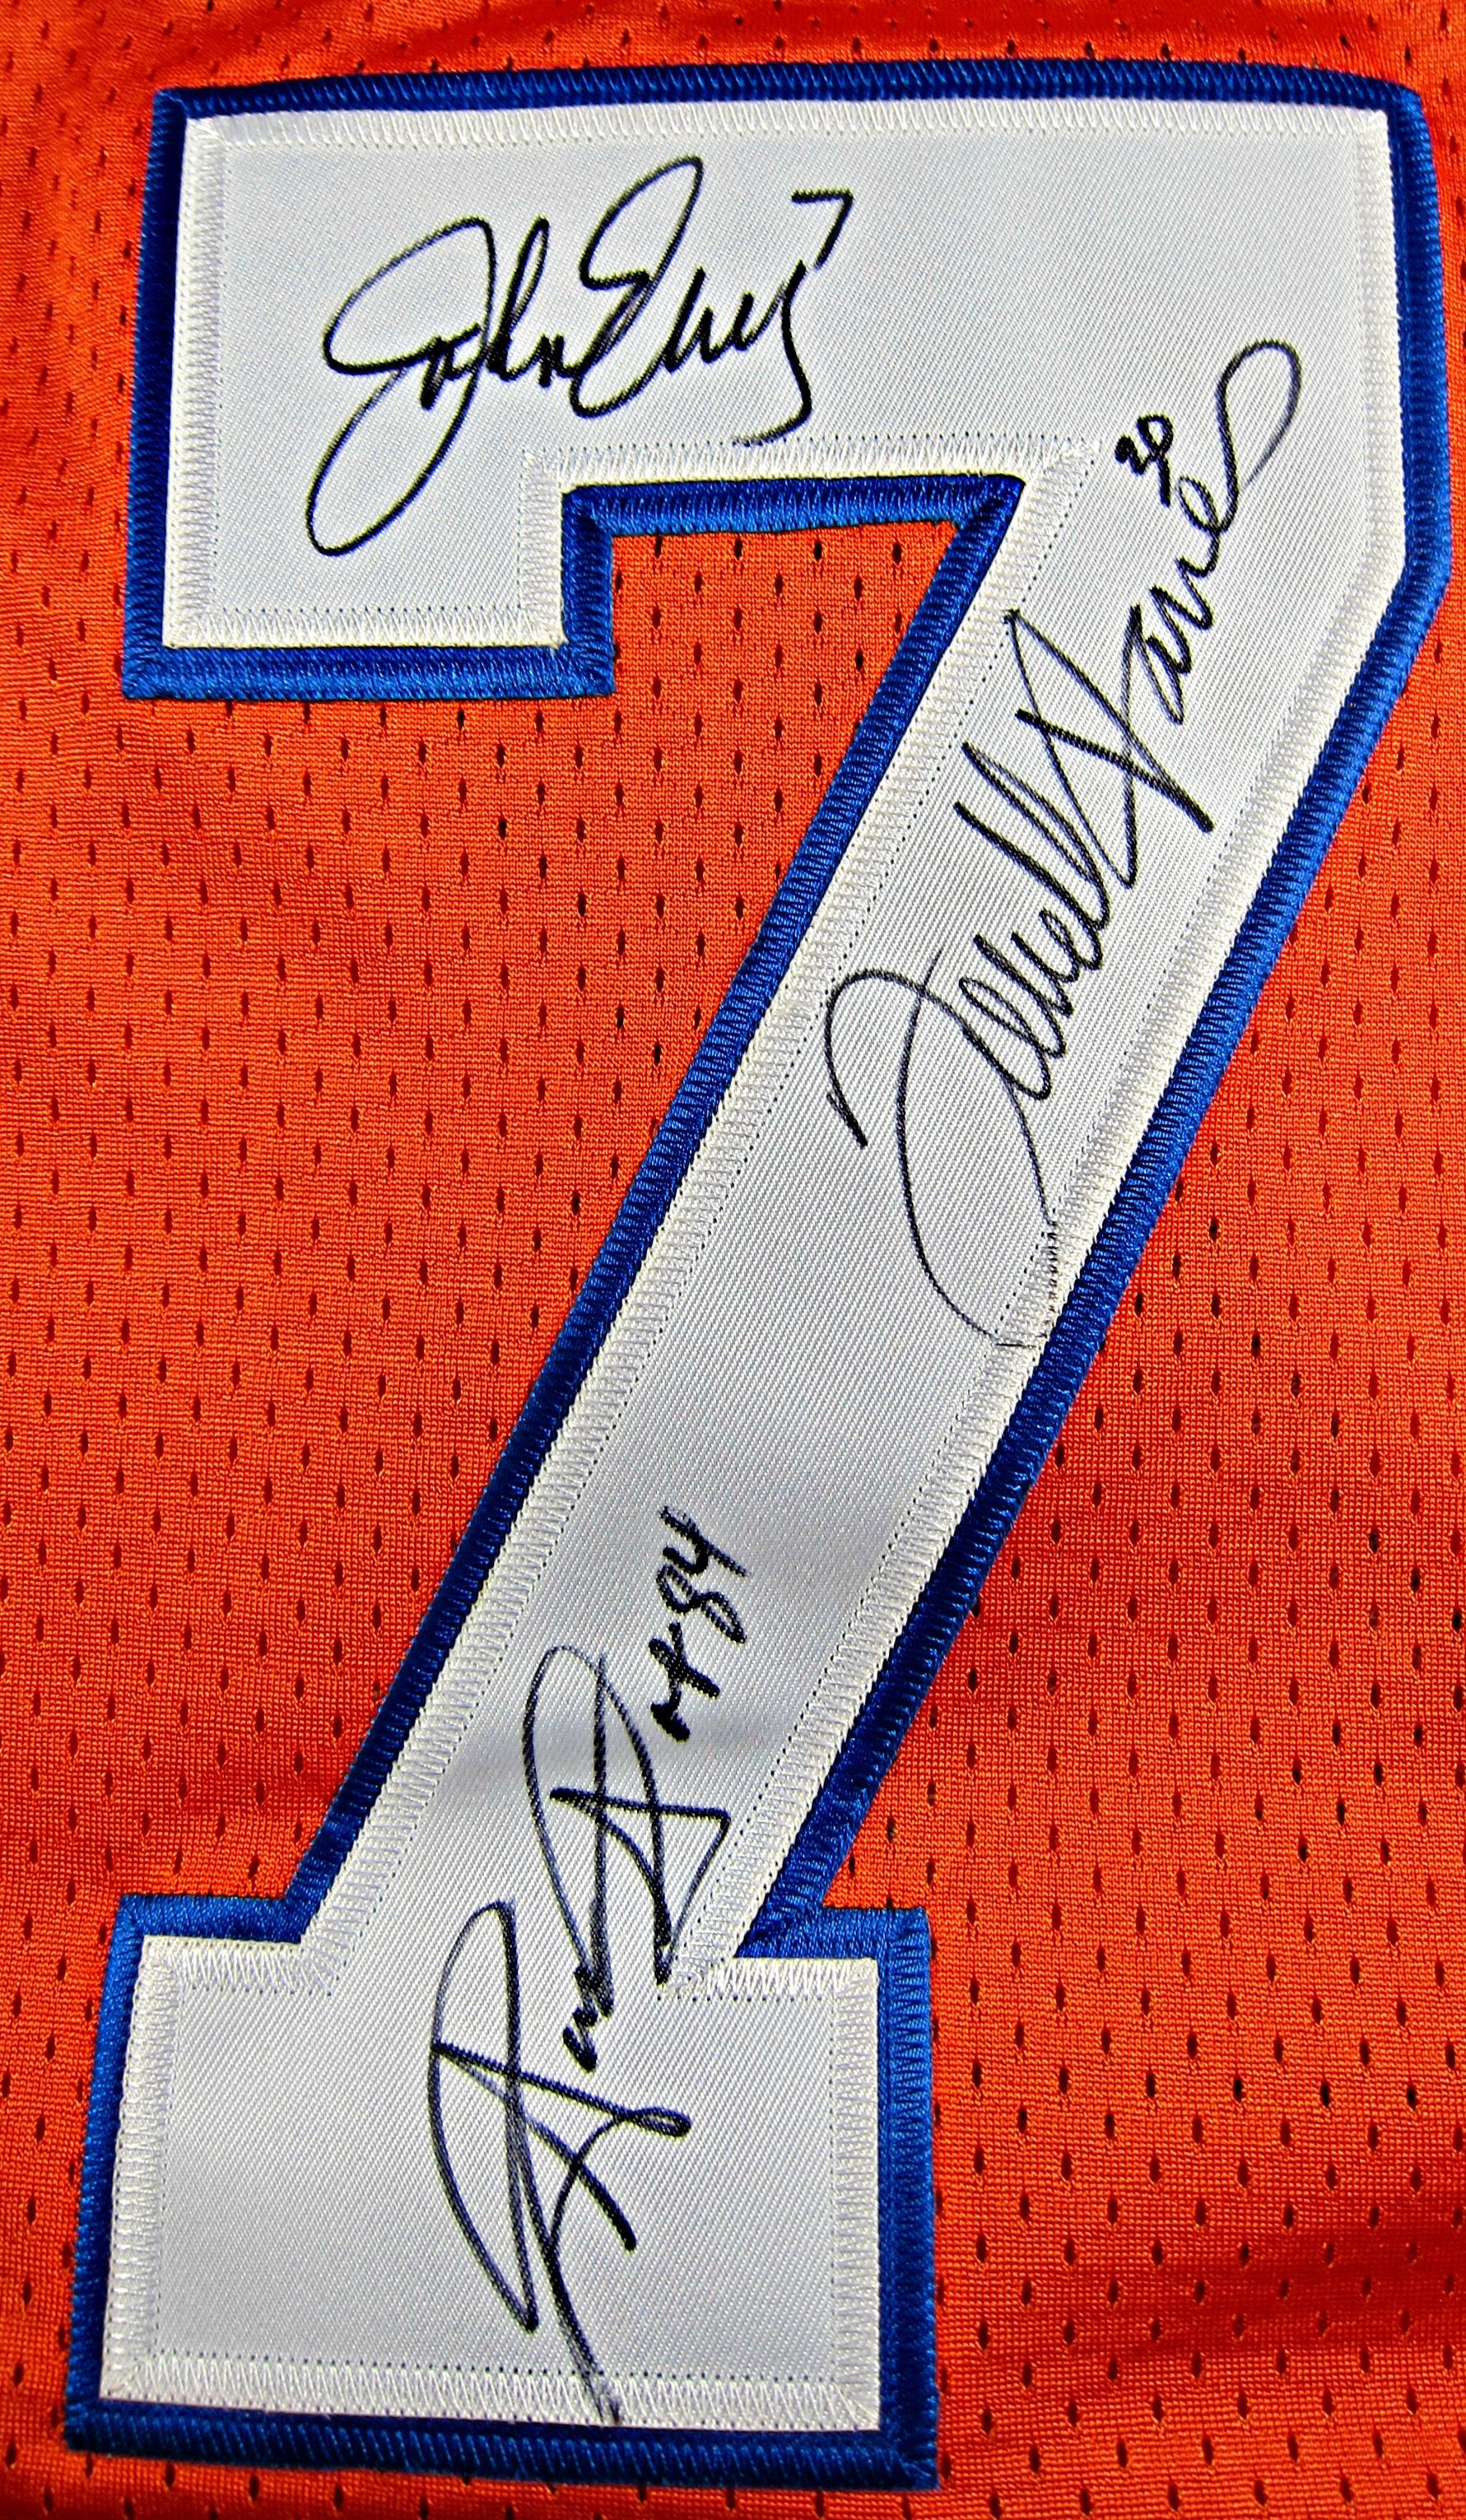 d4de29ec6 Denver Broncos Autographed John Elway Jersey. Sale! 🔍. Denver Broncos · Denver  Broncos